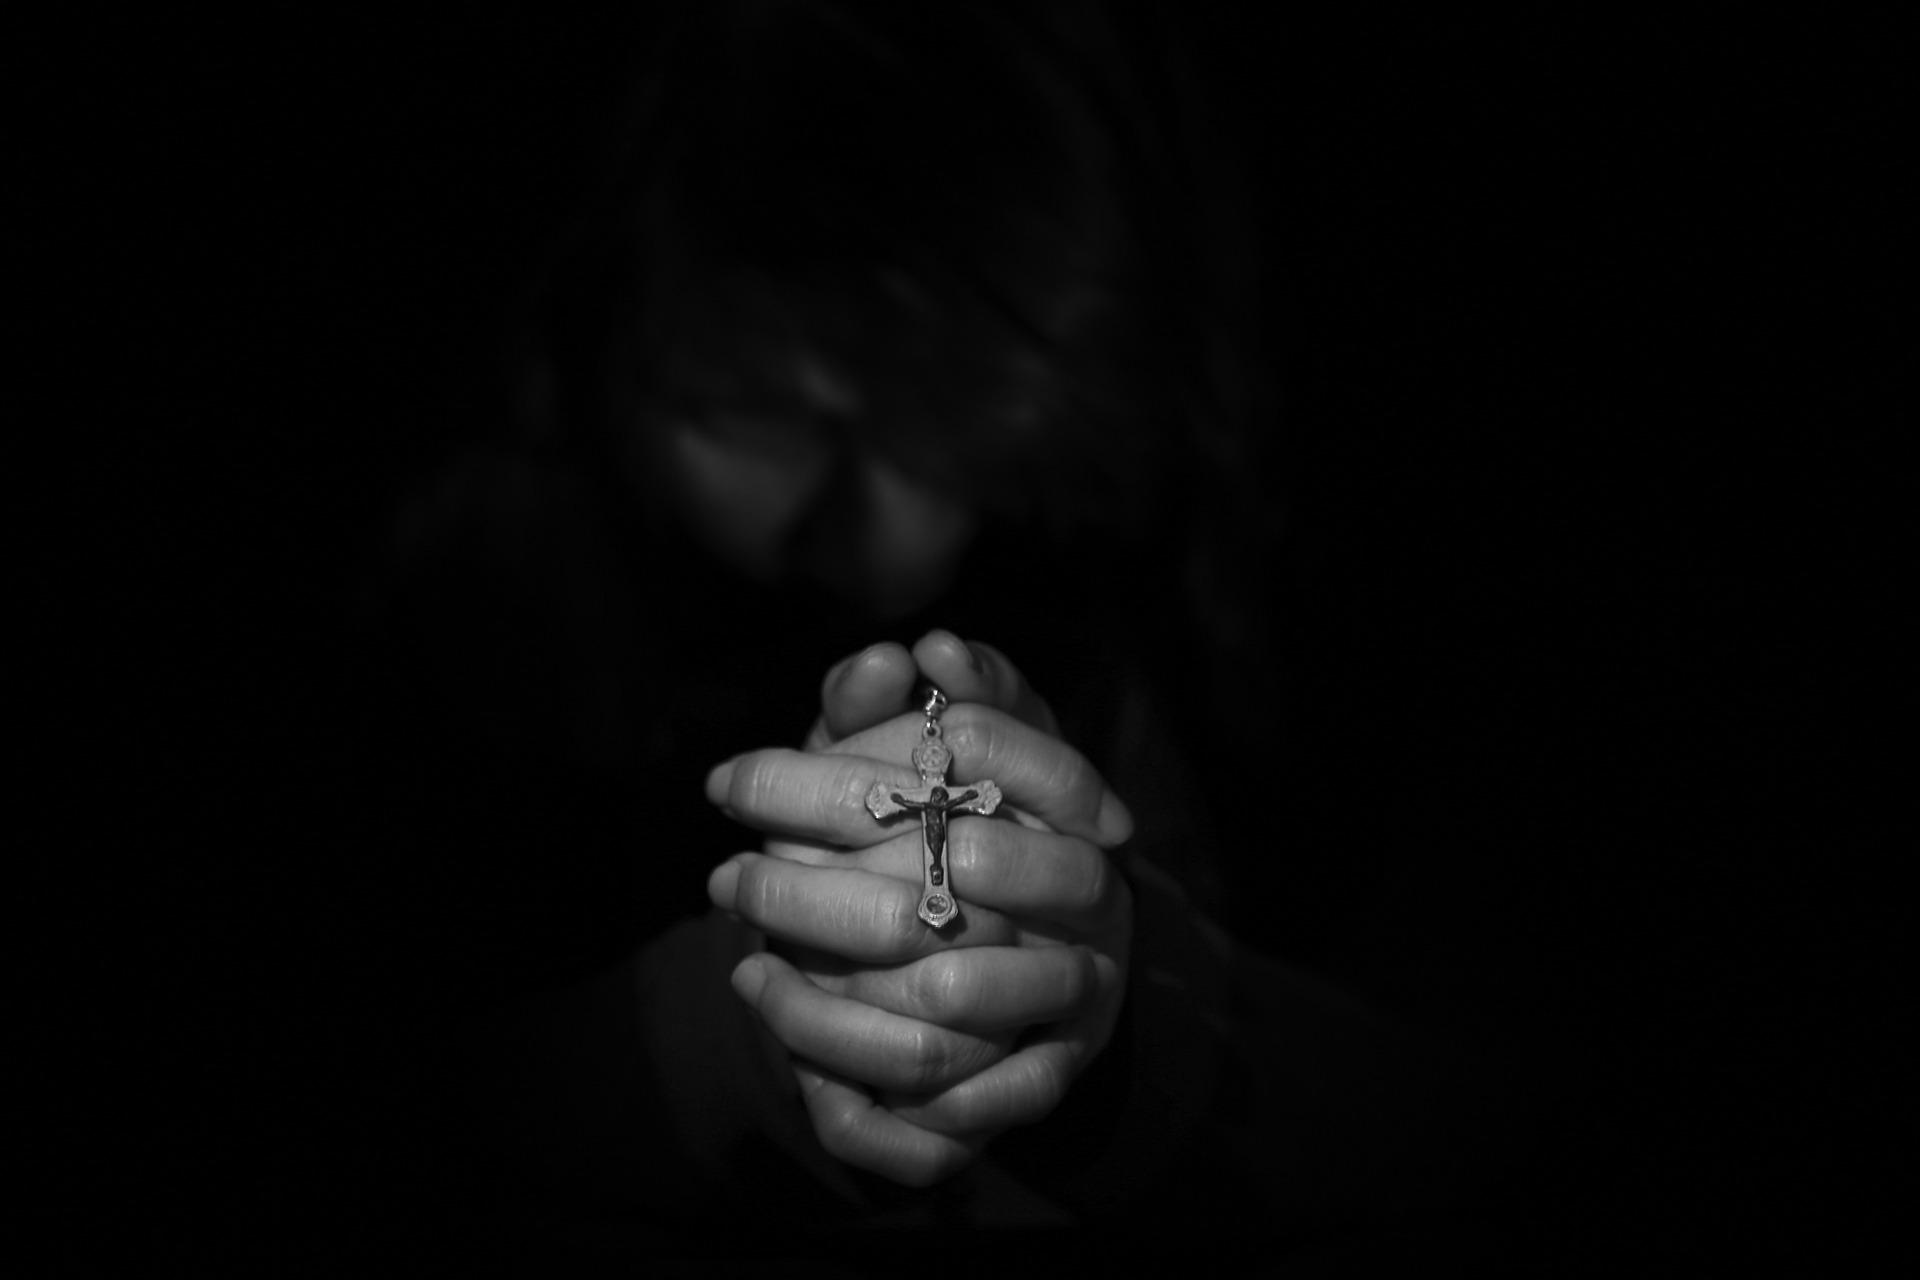 Hands praying religious